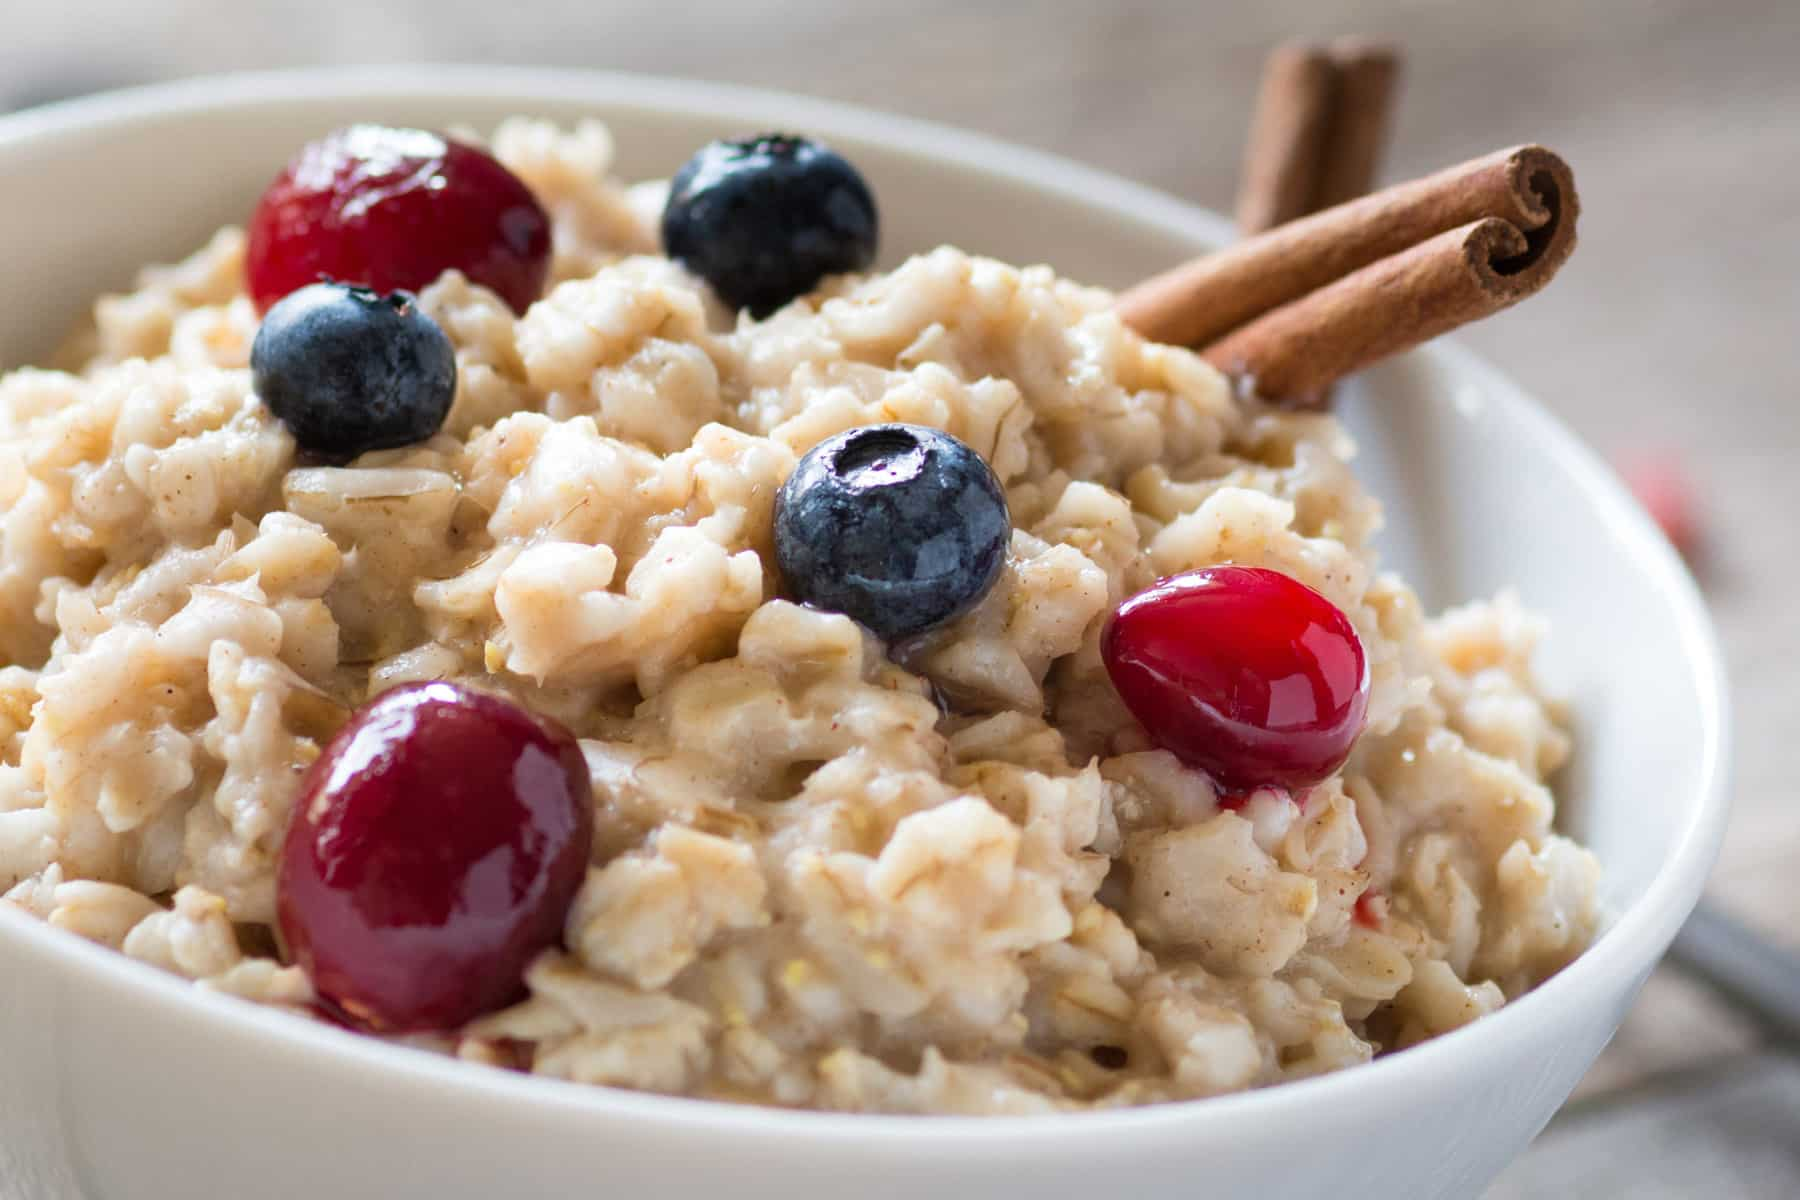 10 Merk Oatmeal Kaya Serat untuk Diet dan Masker Wajah